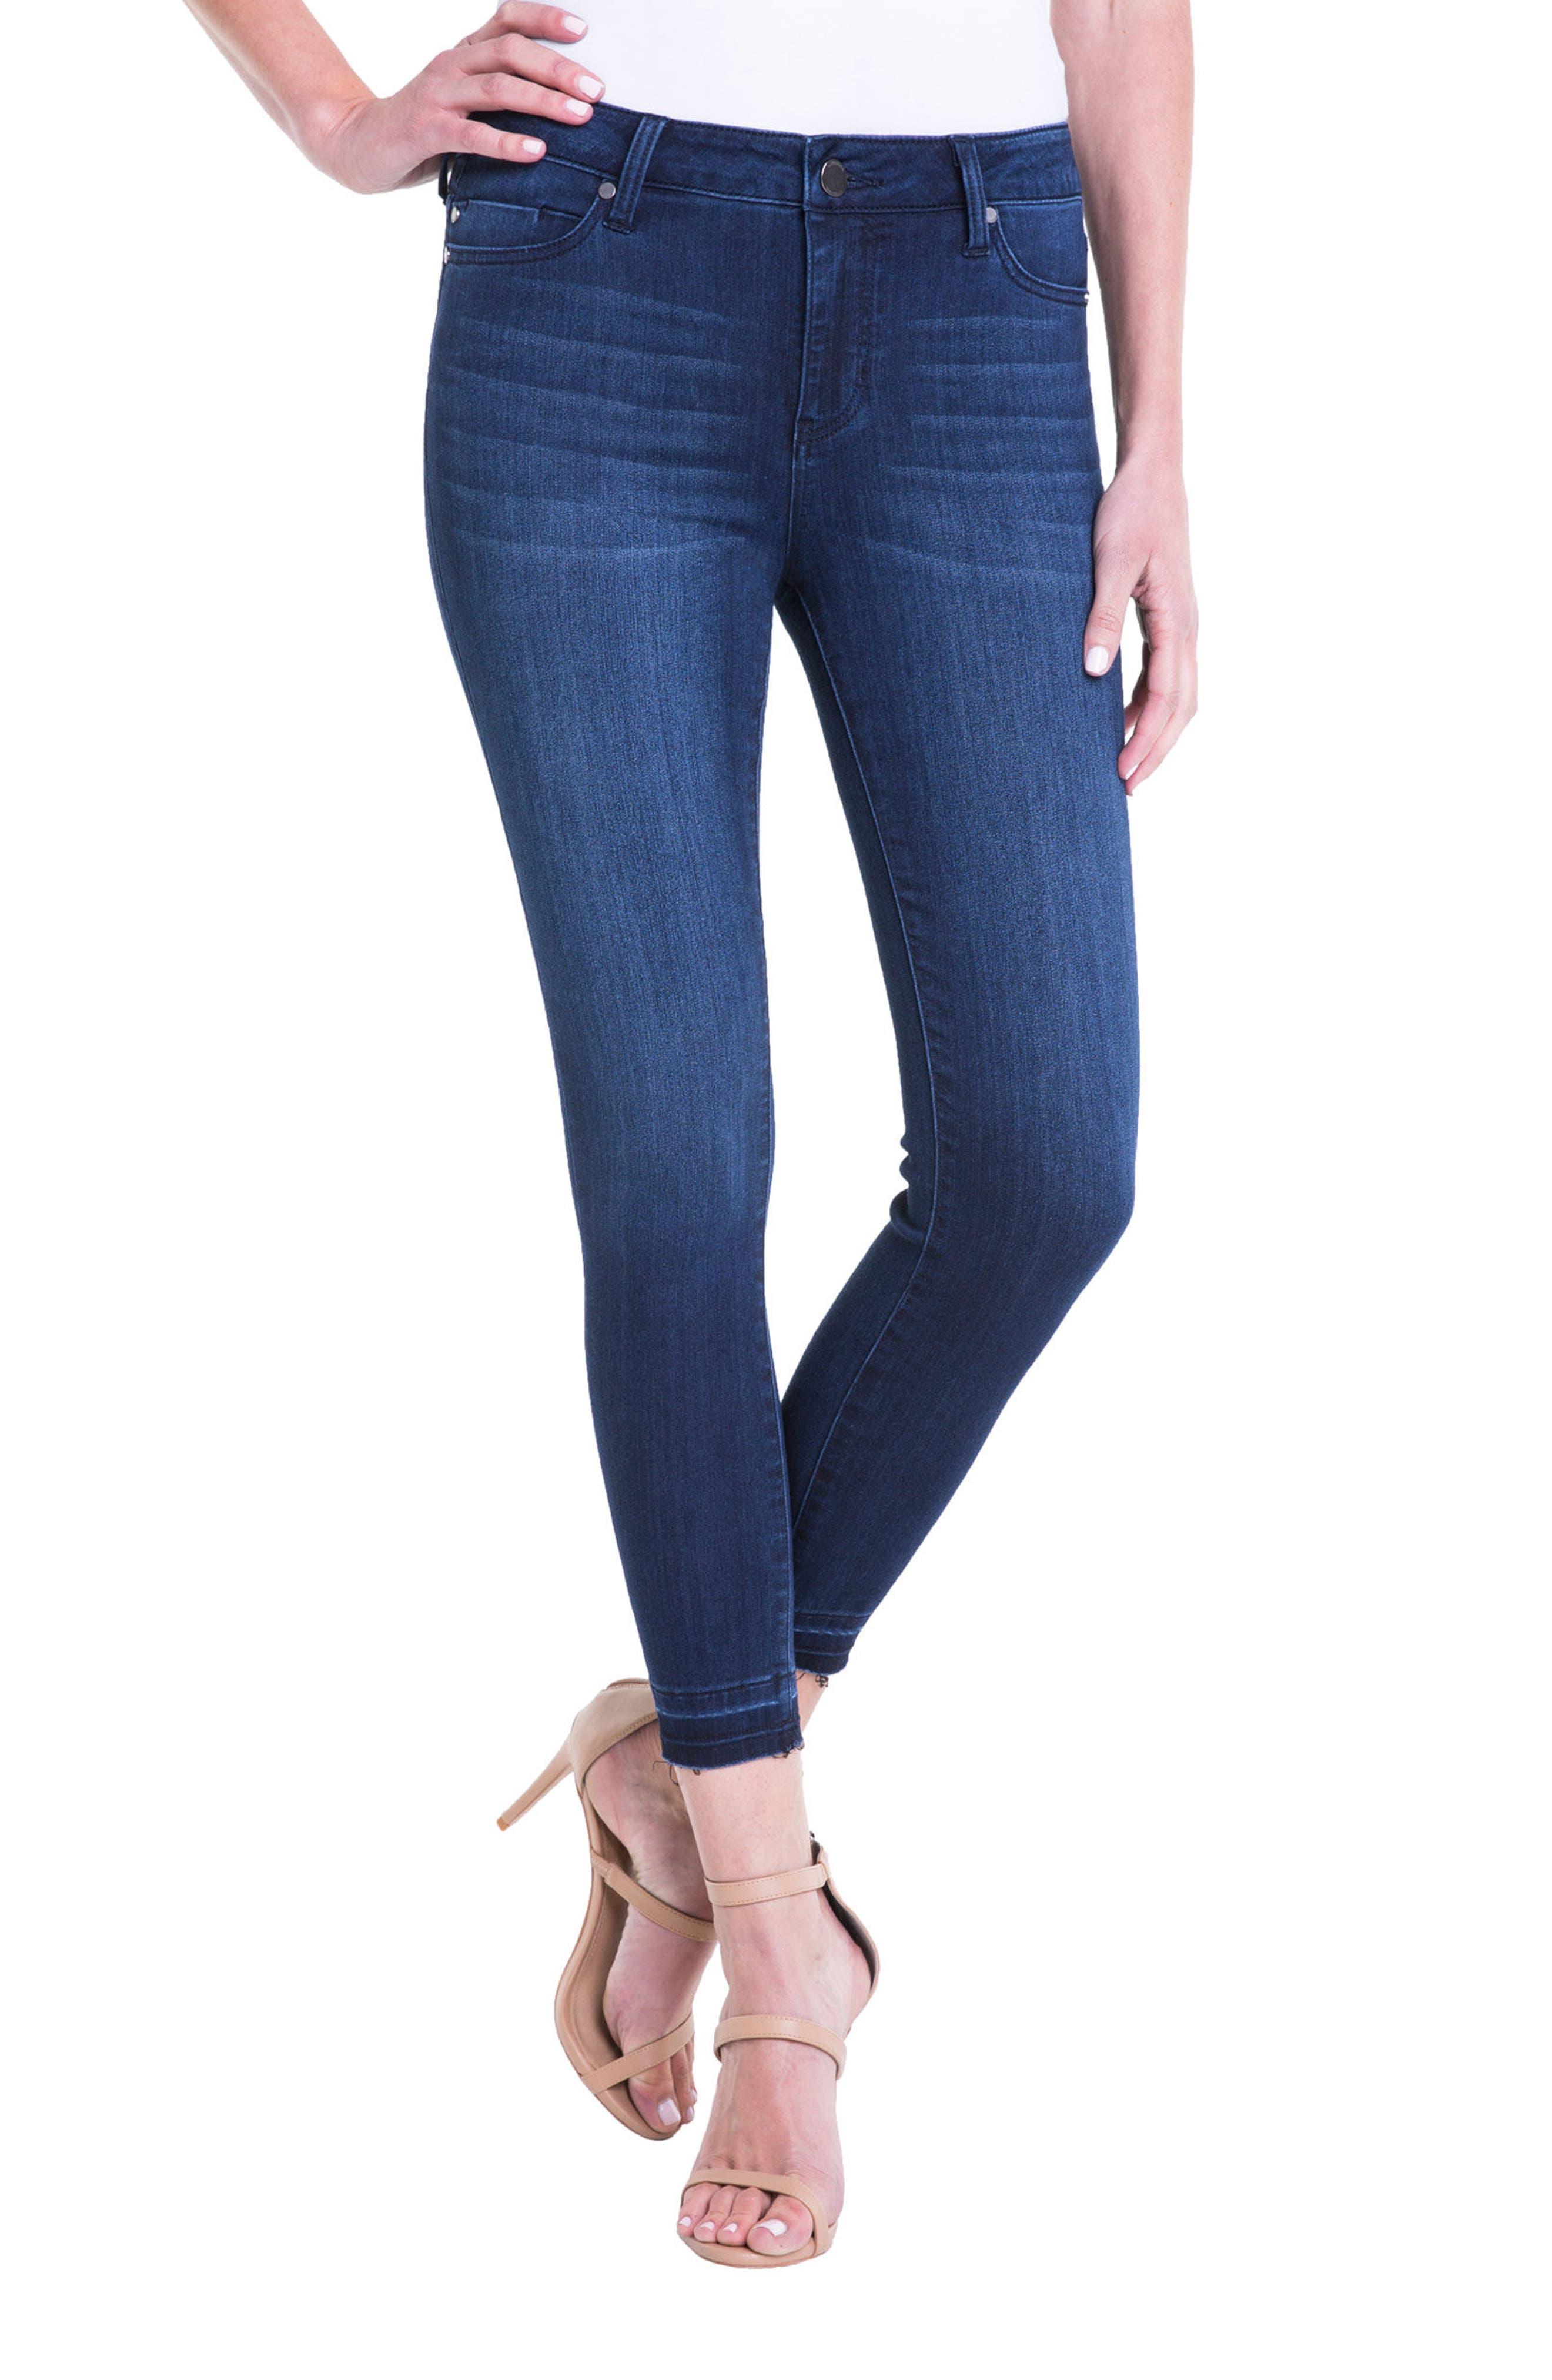 Liverpool Jeans Company Avery High Rise Release Hem Stretch Crop Skinny Jeans (Estrella Med Dark)